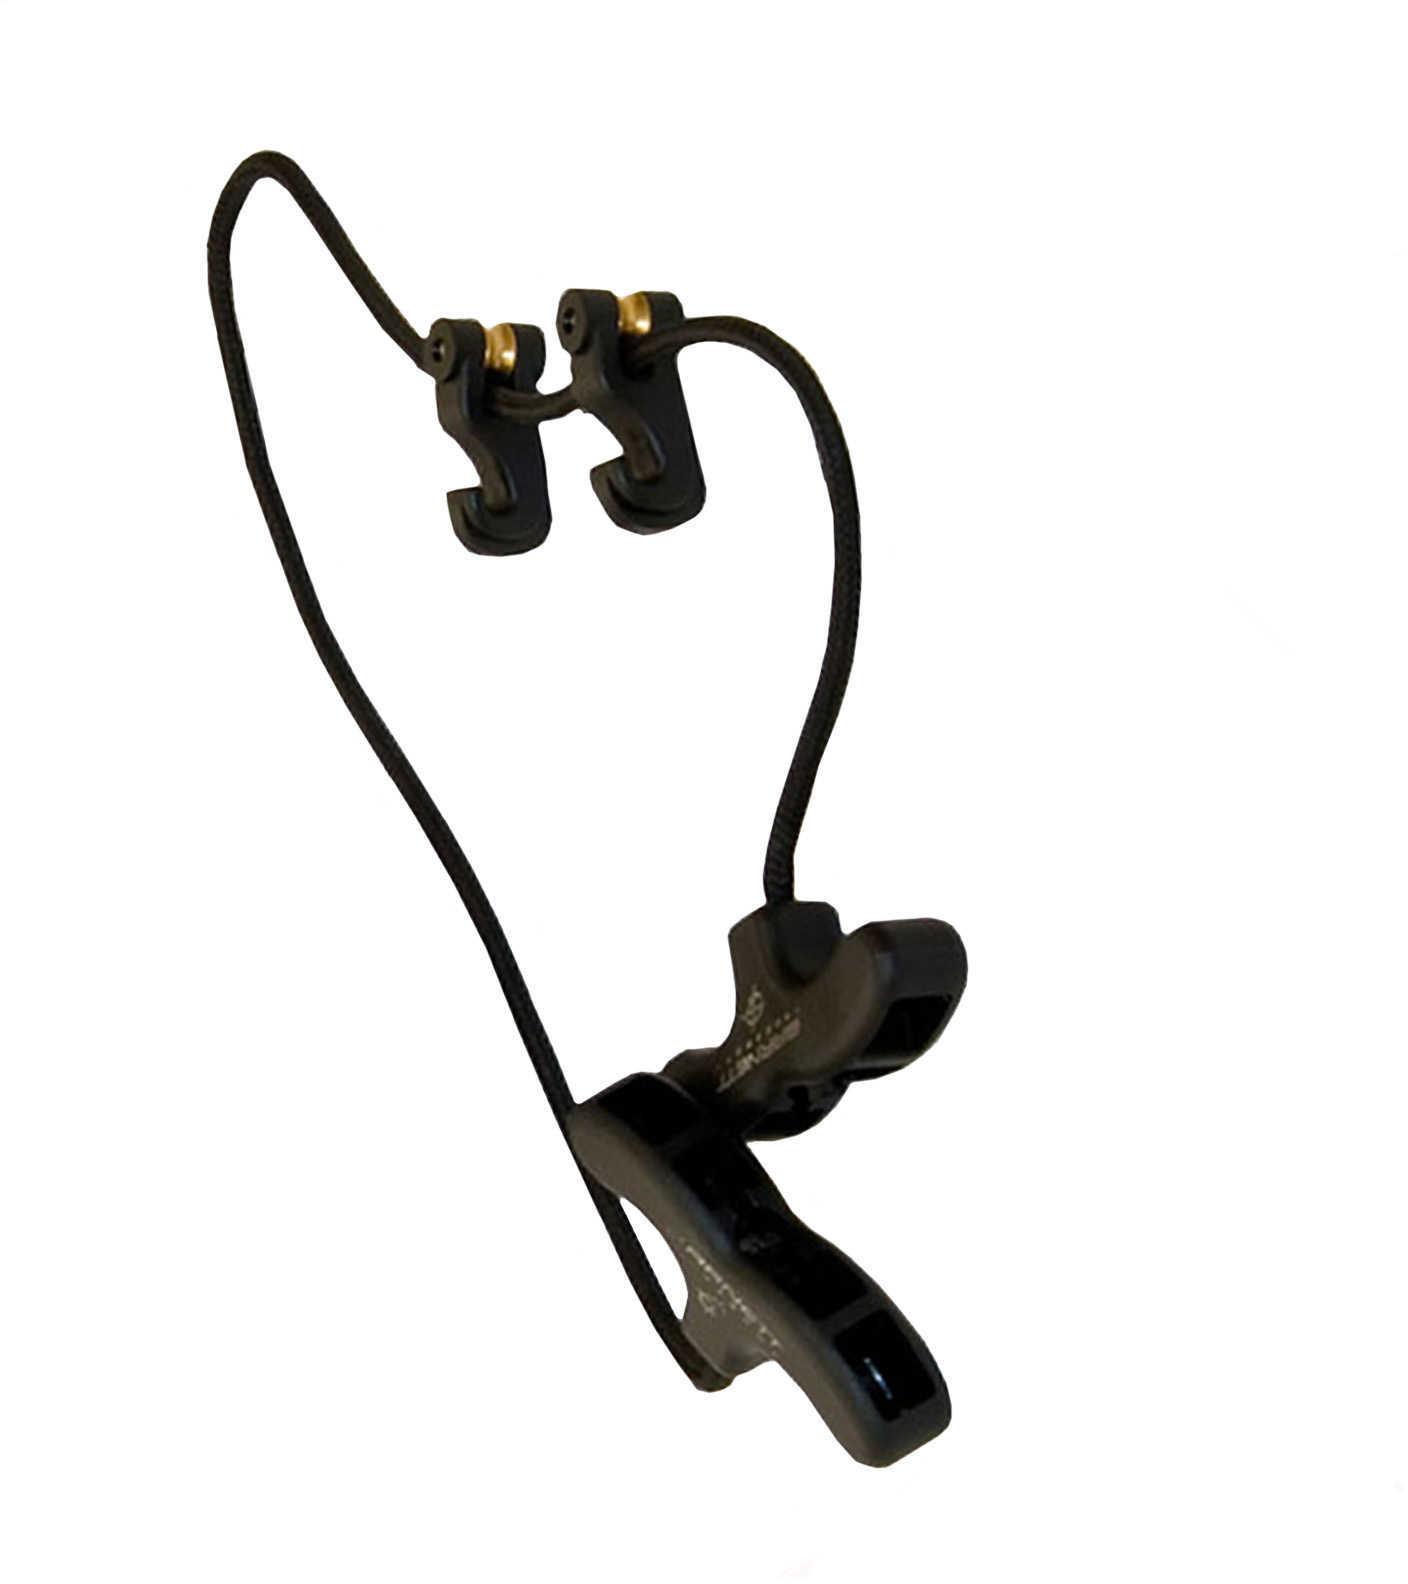 Barnett Rope Cocking Device Md: 17014